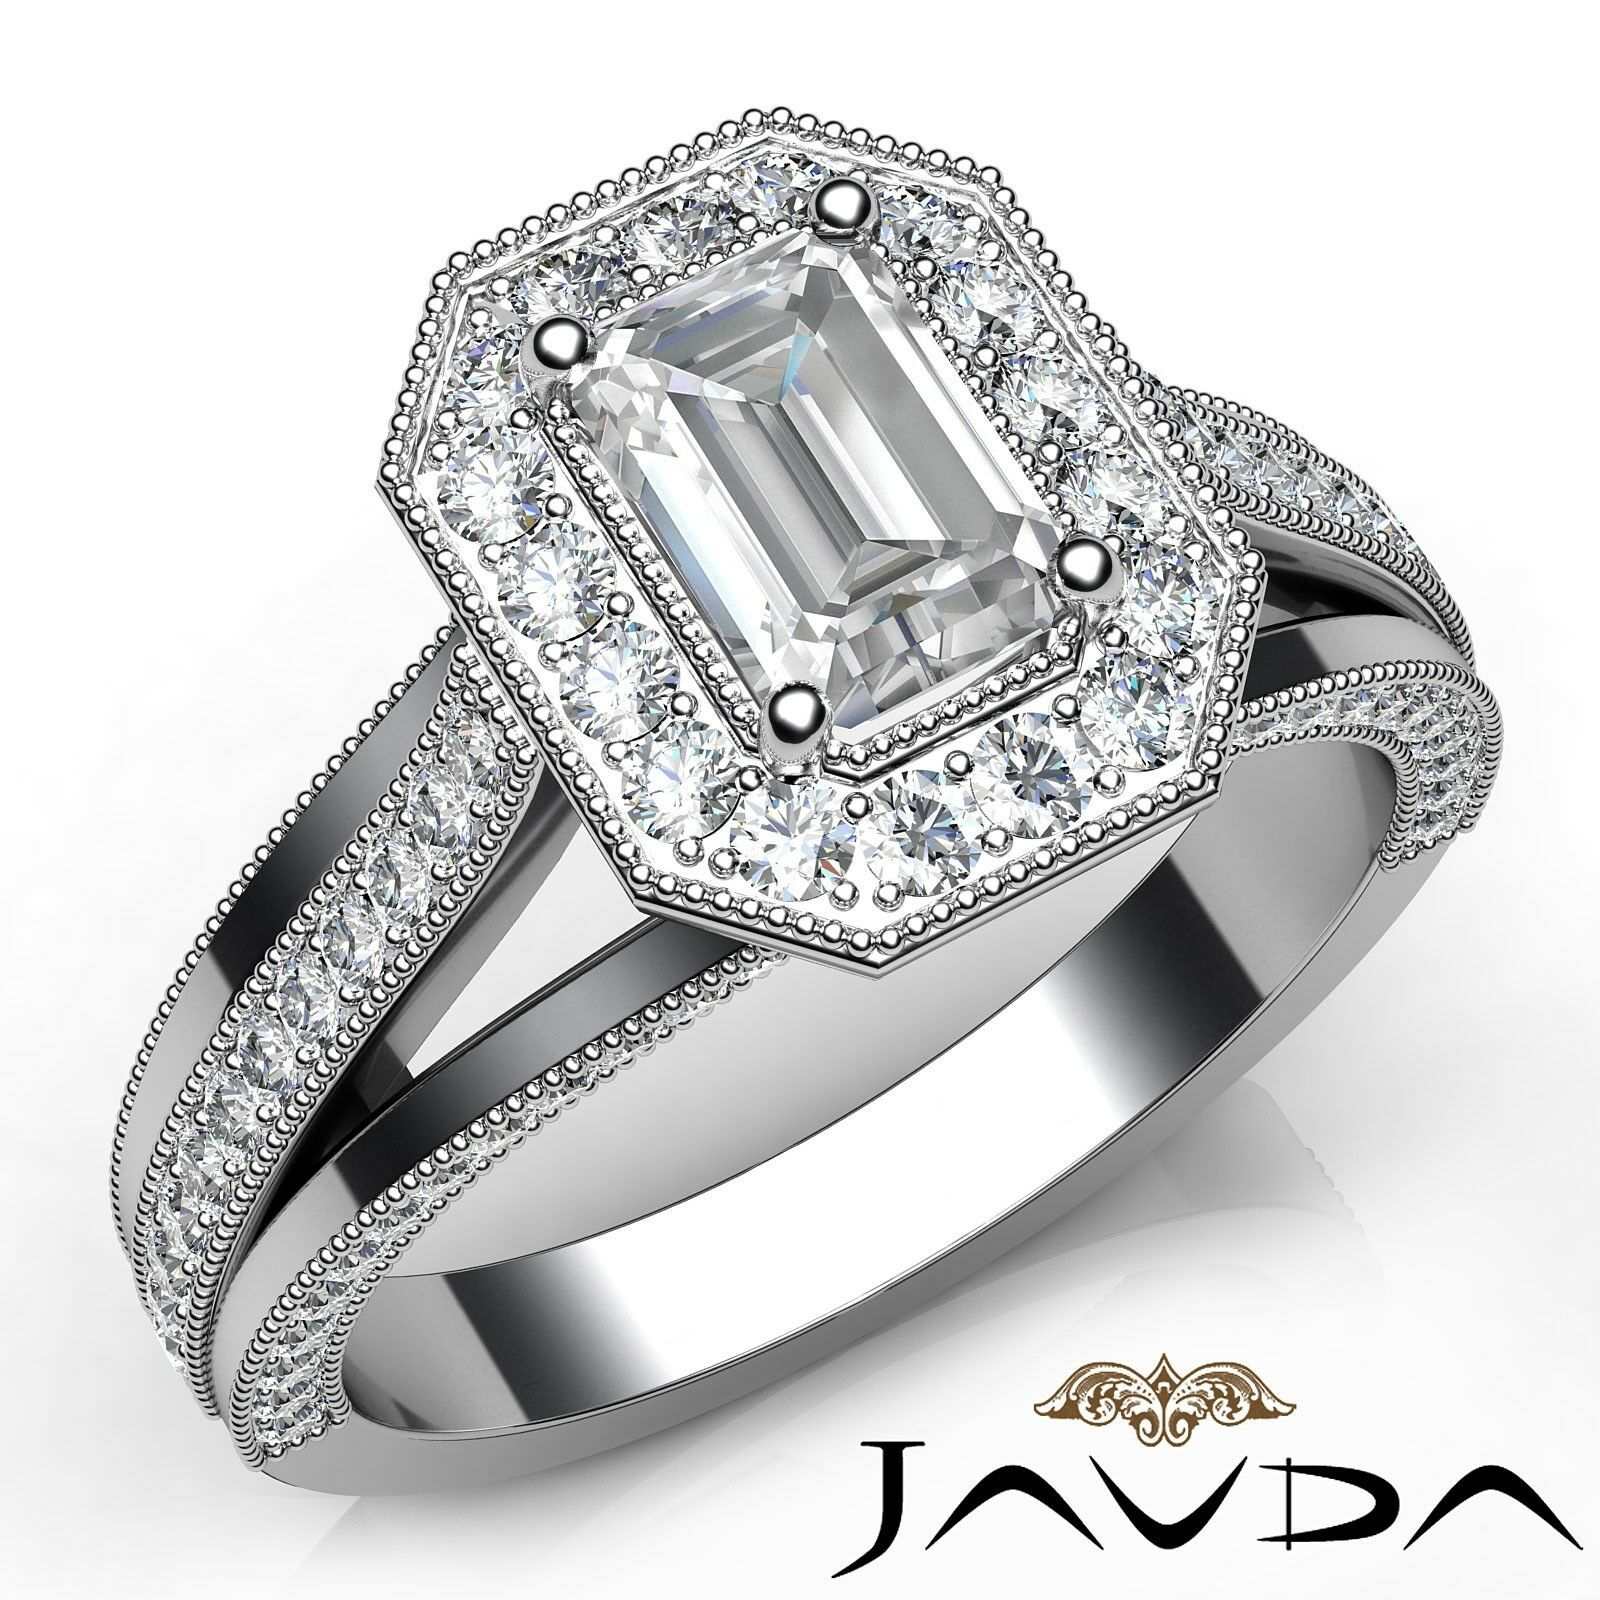 1.4ctw Milgrain Side-Stone Emerald Diamond Engagement Ring GIA F-VVS1 White Gold